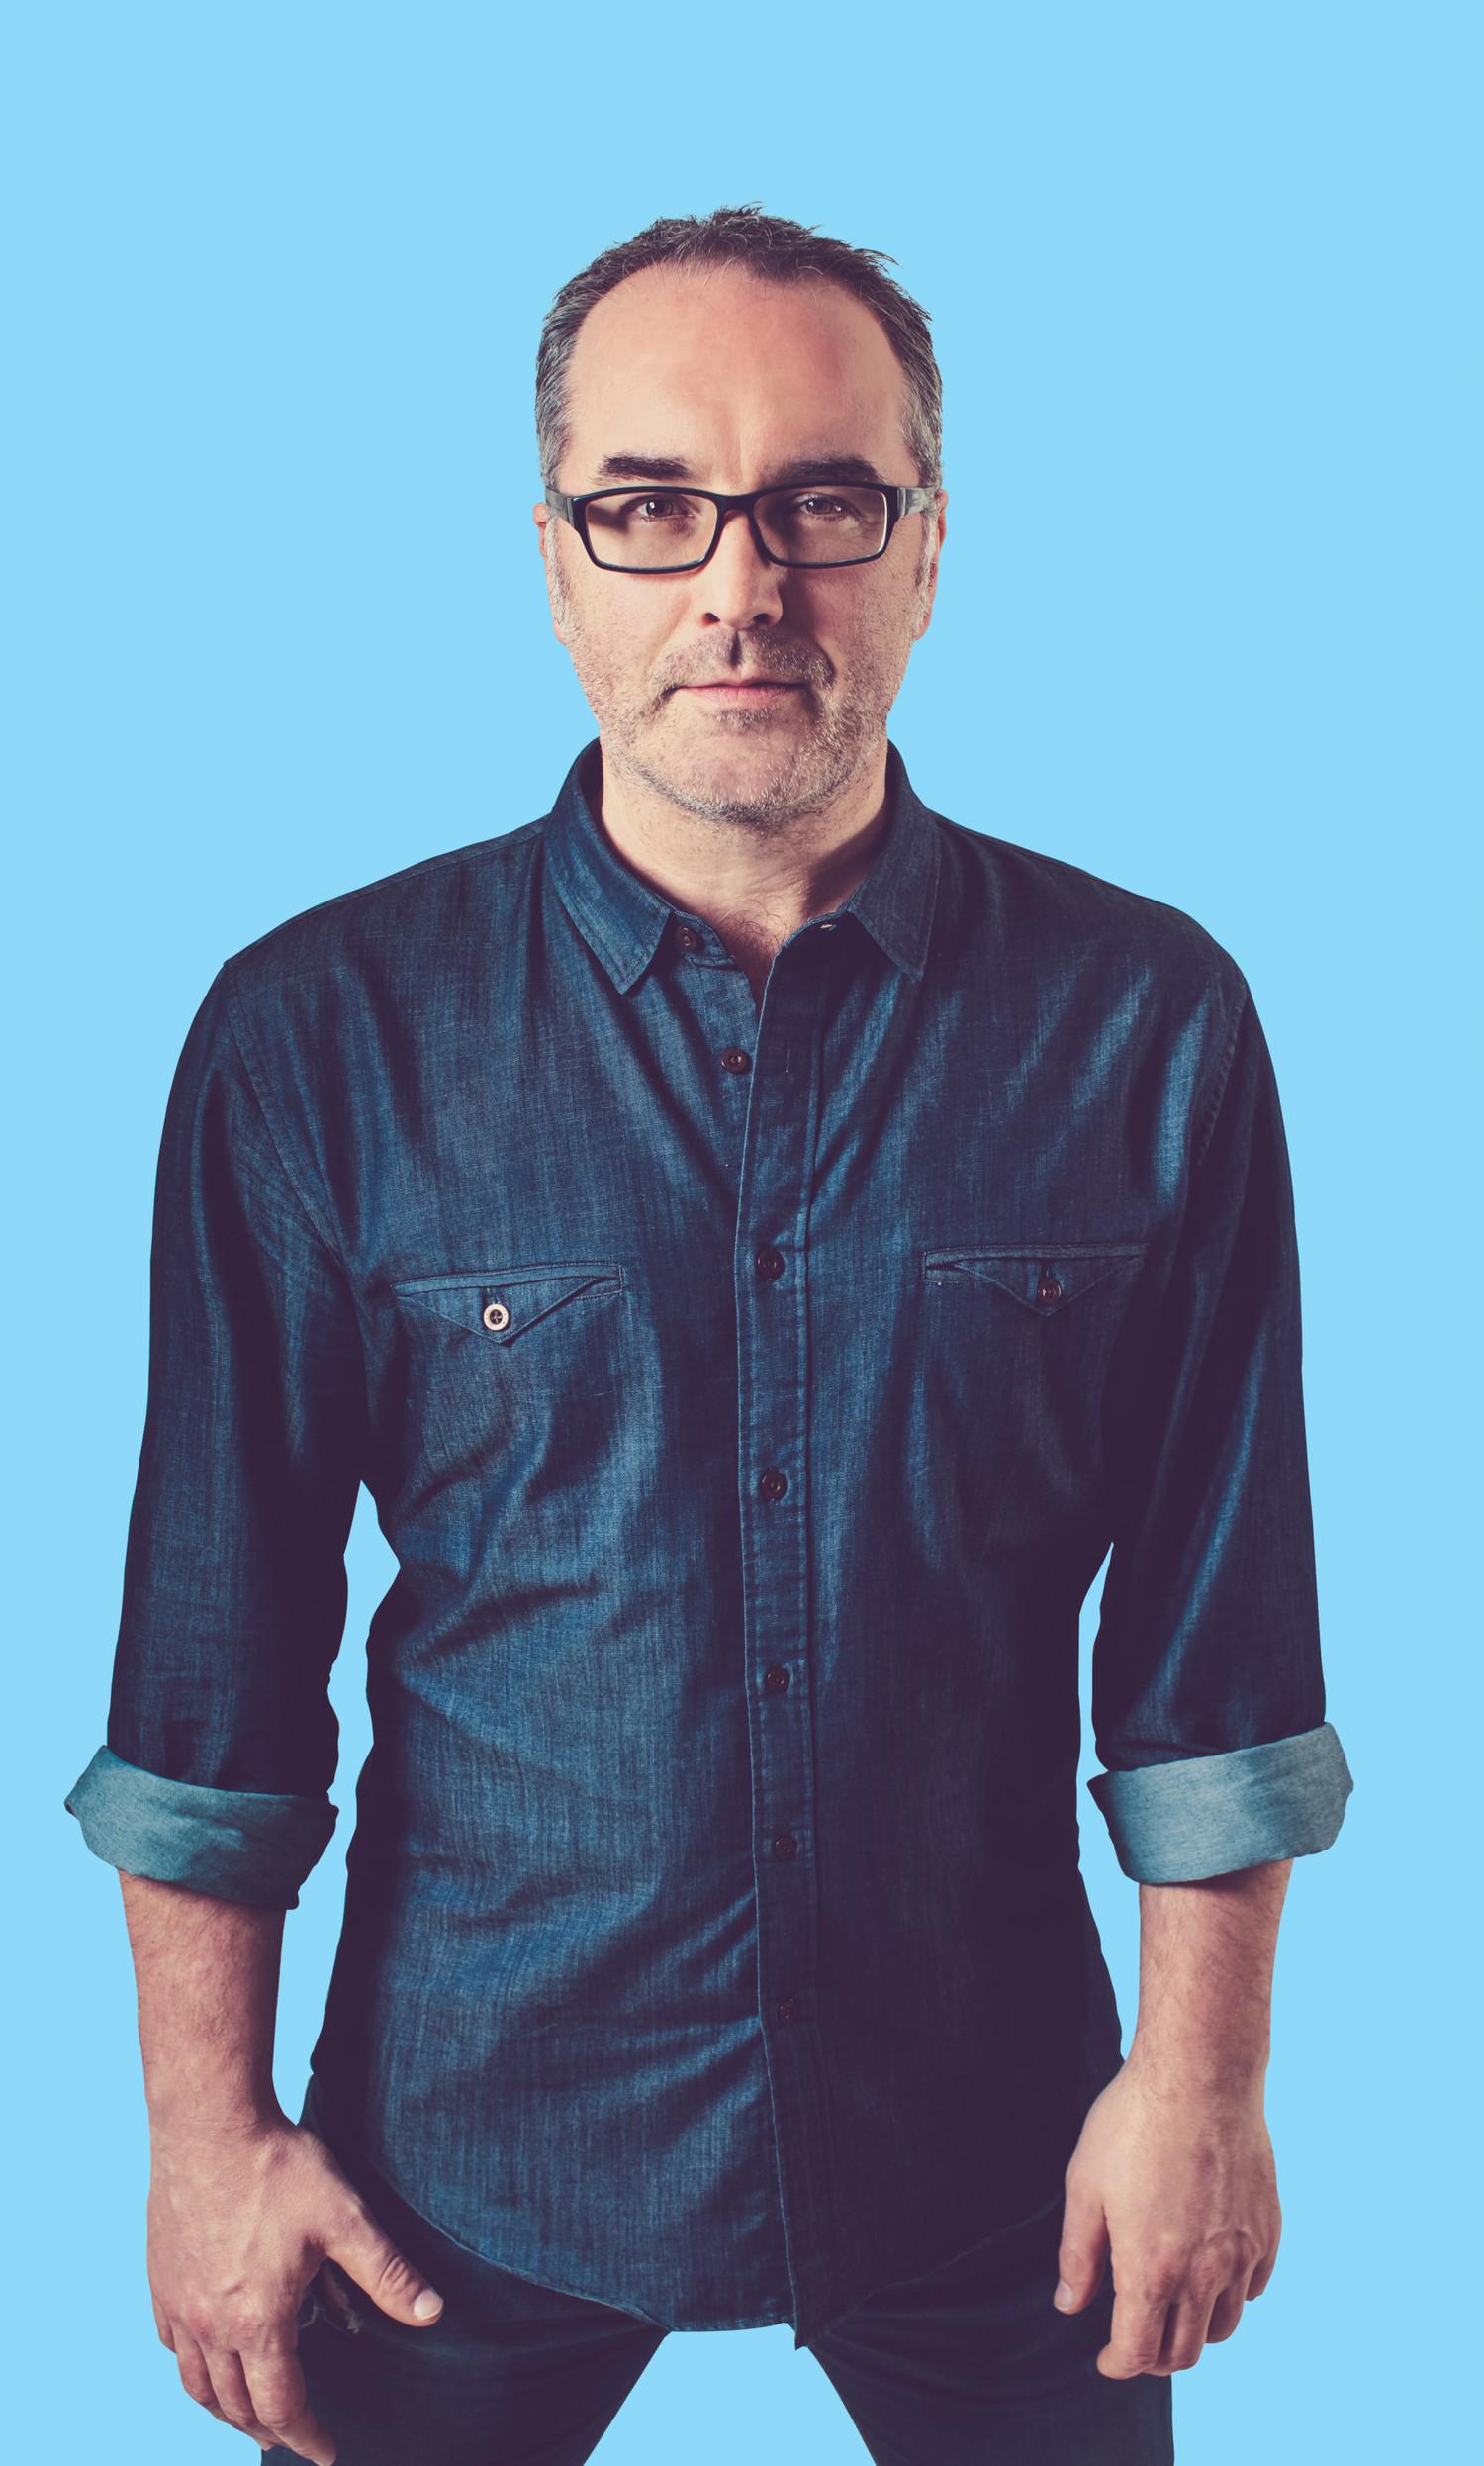 BWW Interview: Justin Hamilton of THE BALLAD OF JOHN TILT ANIMUS at Melbourne International Comedy Festival